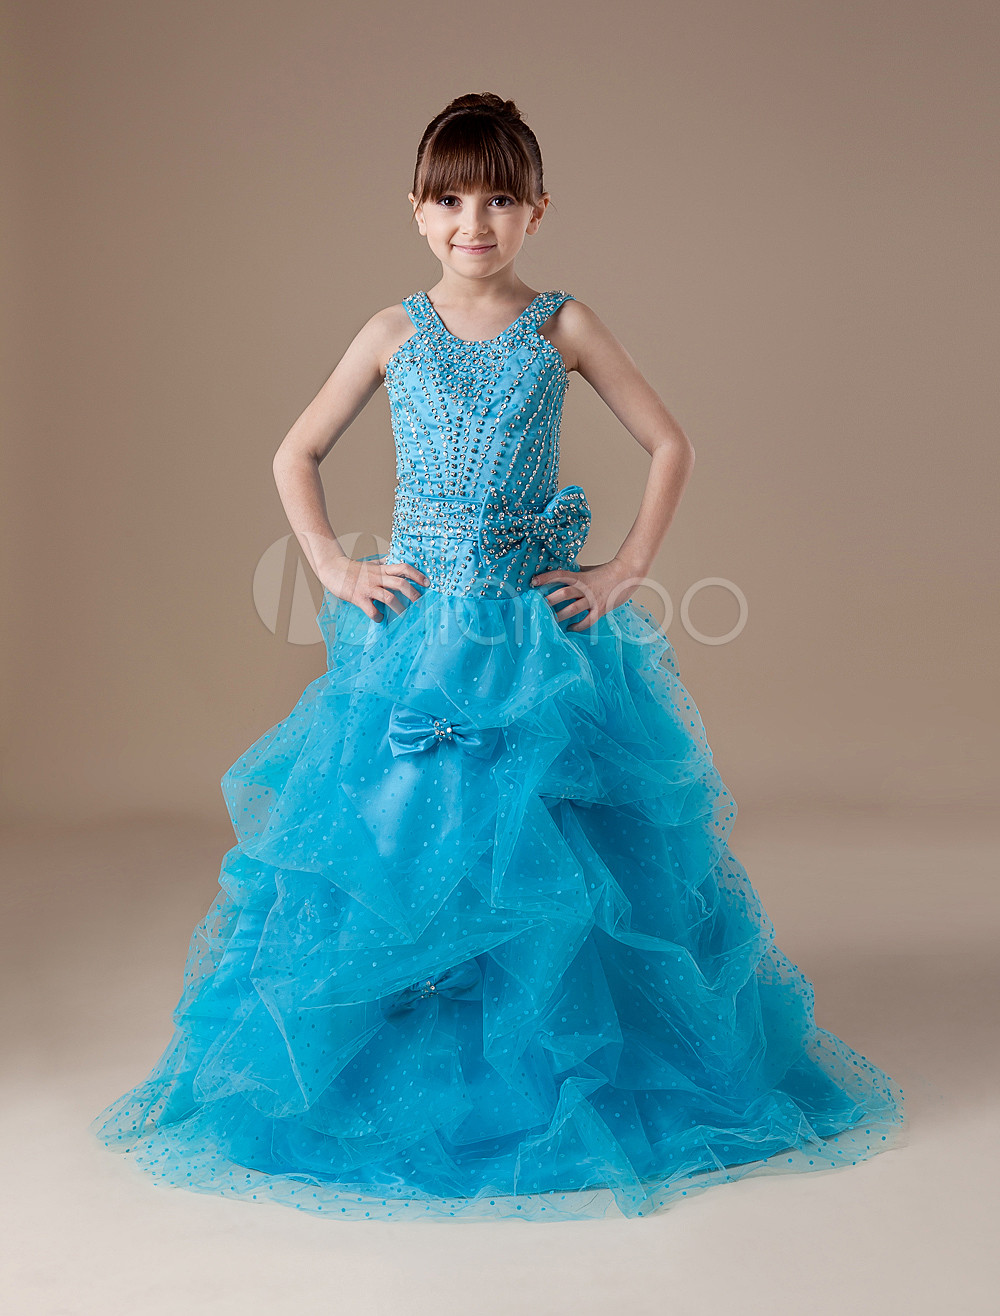 b30035a1d28 Toddler s Pageant Dress Aqua Organza Straps Beading Bow Ball Gown Floor  Length Flower Girl Dress - Milanoo.com